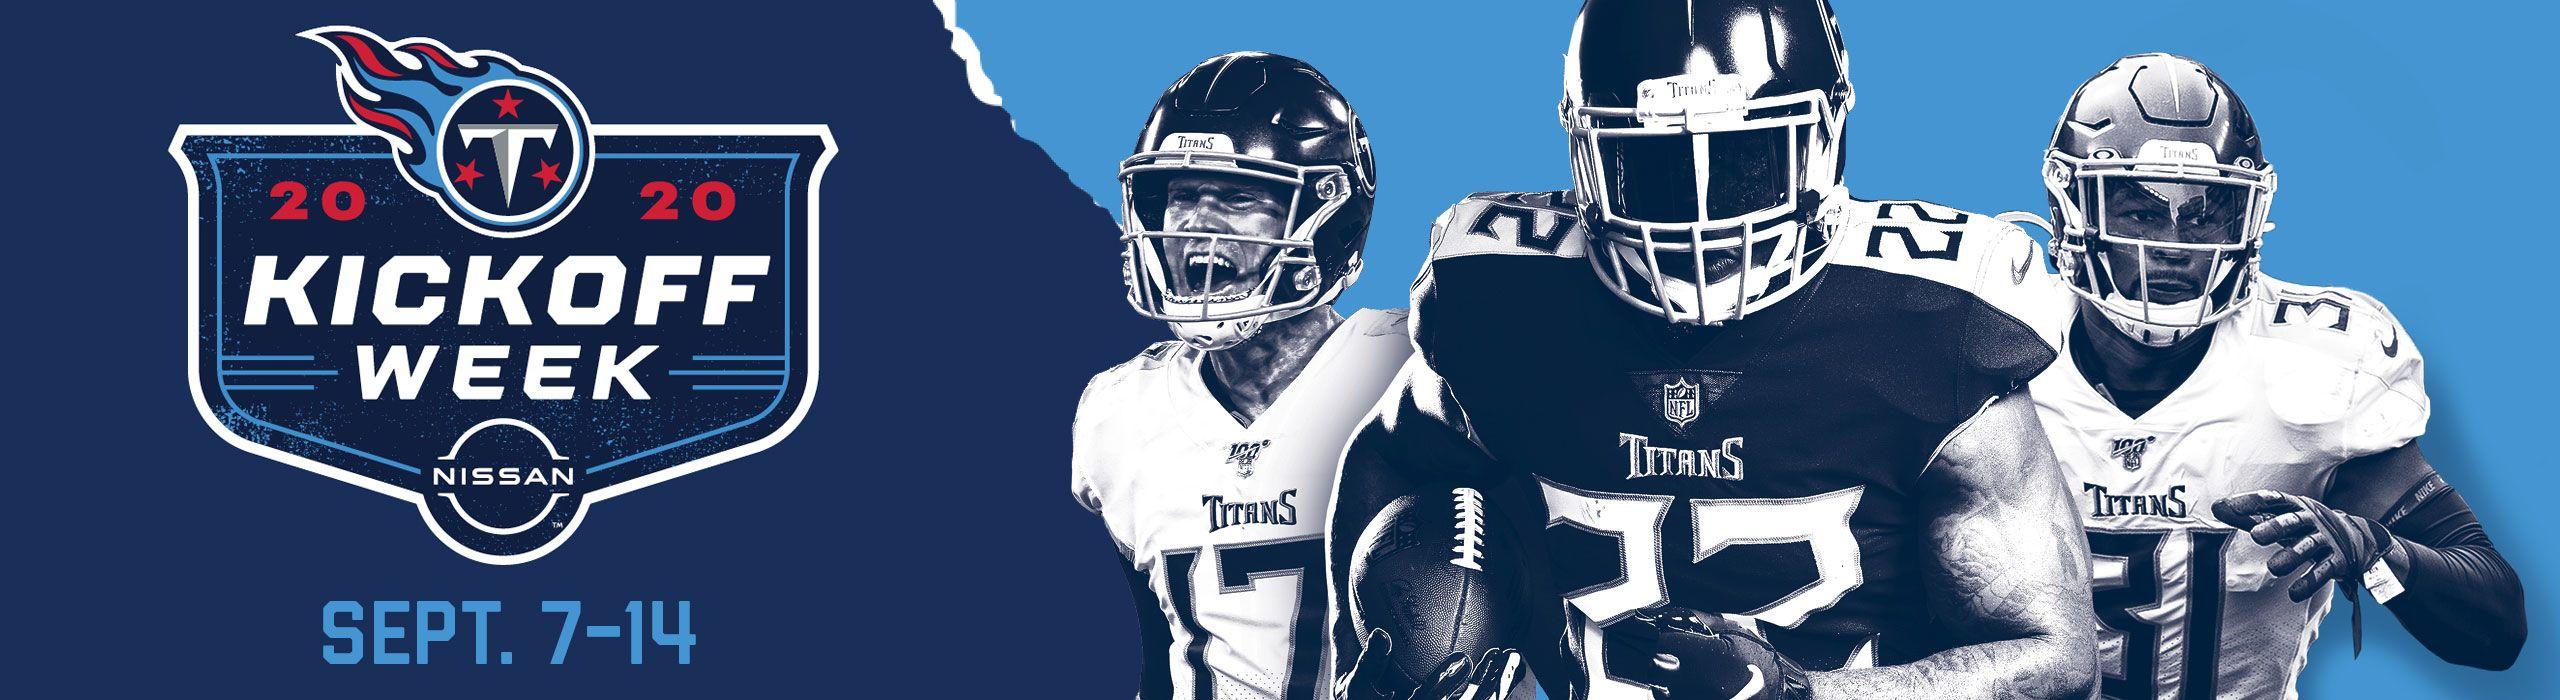 titans-kickoff-week-2020